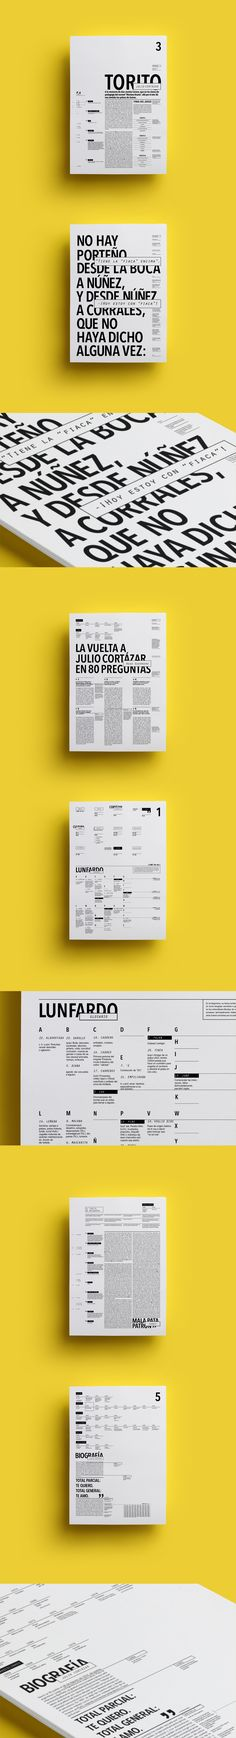 LUNFARDO | Editorial - Tipografía 2 Longinotti